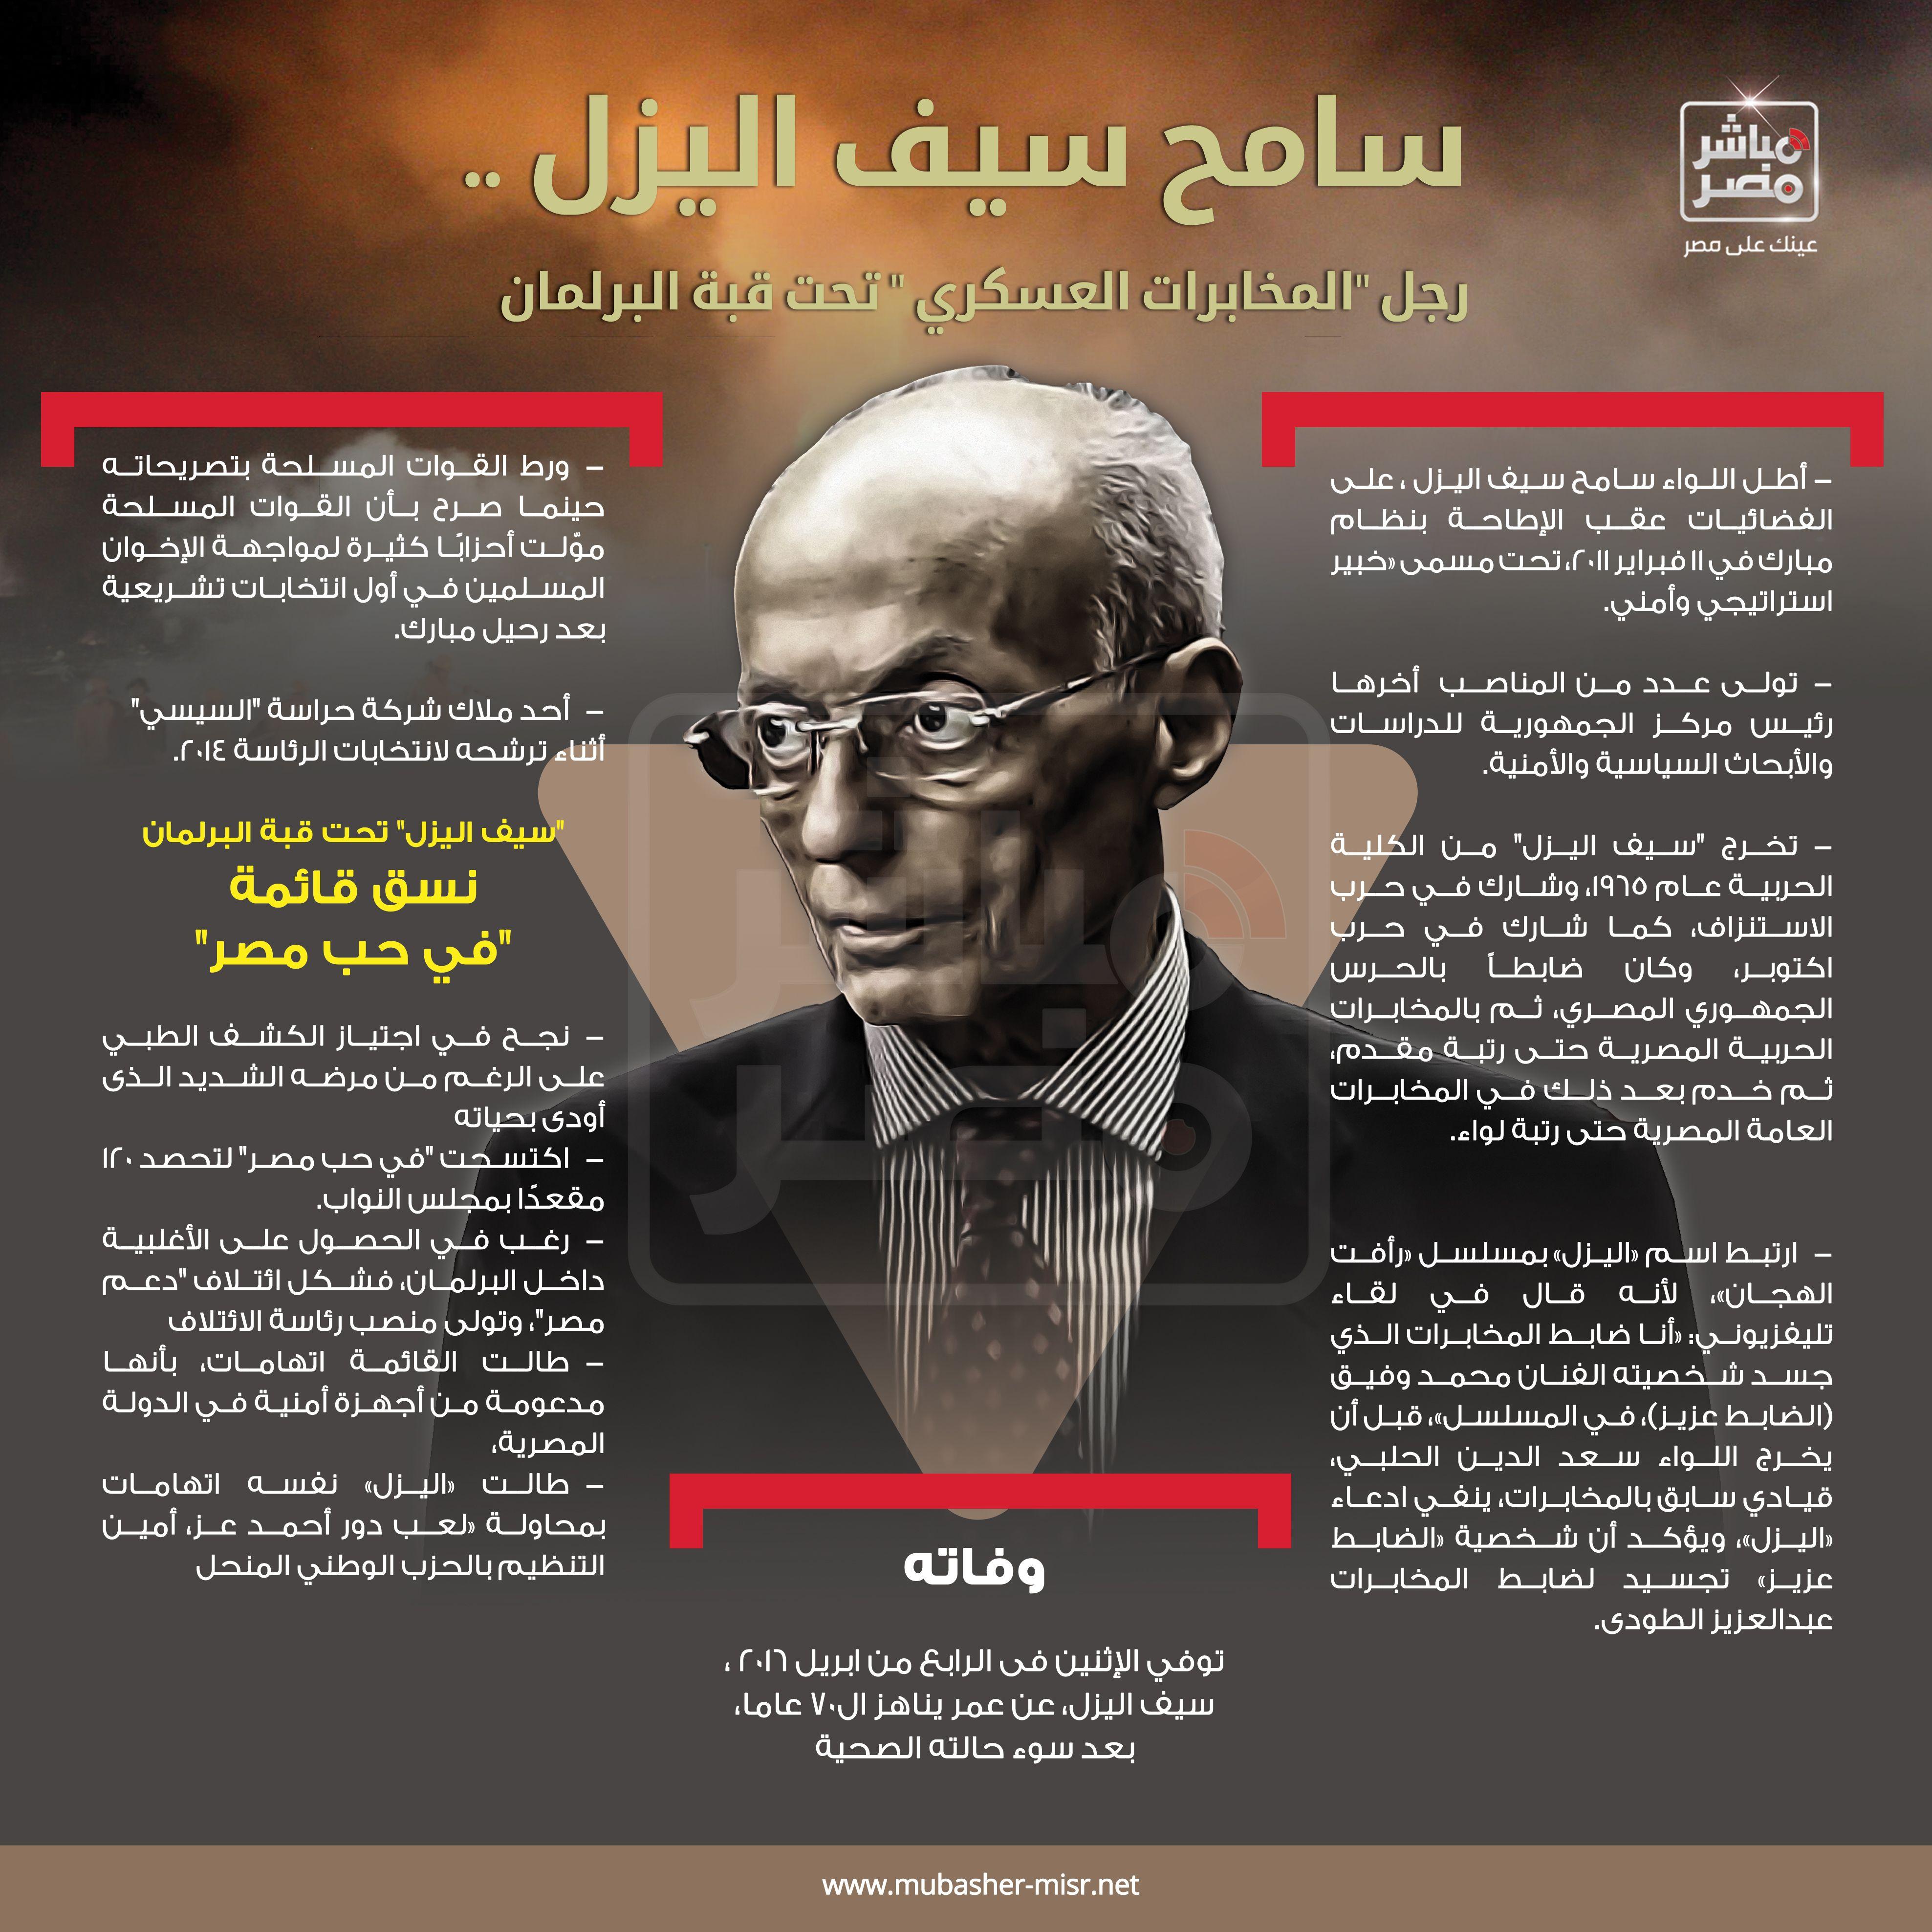 Pin By شبكة مباشر مصر On إنفوجراف مباشر مصر Poster Movies